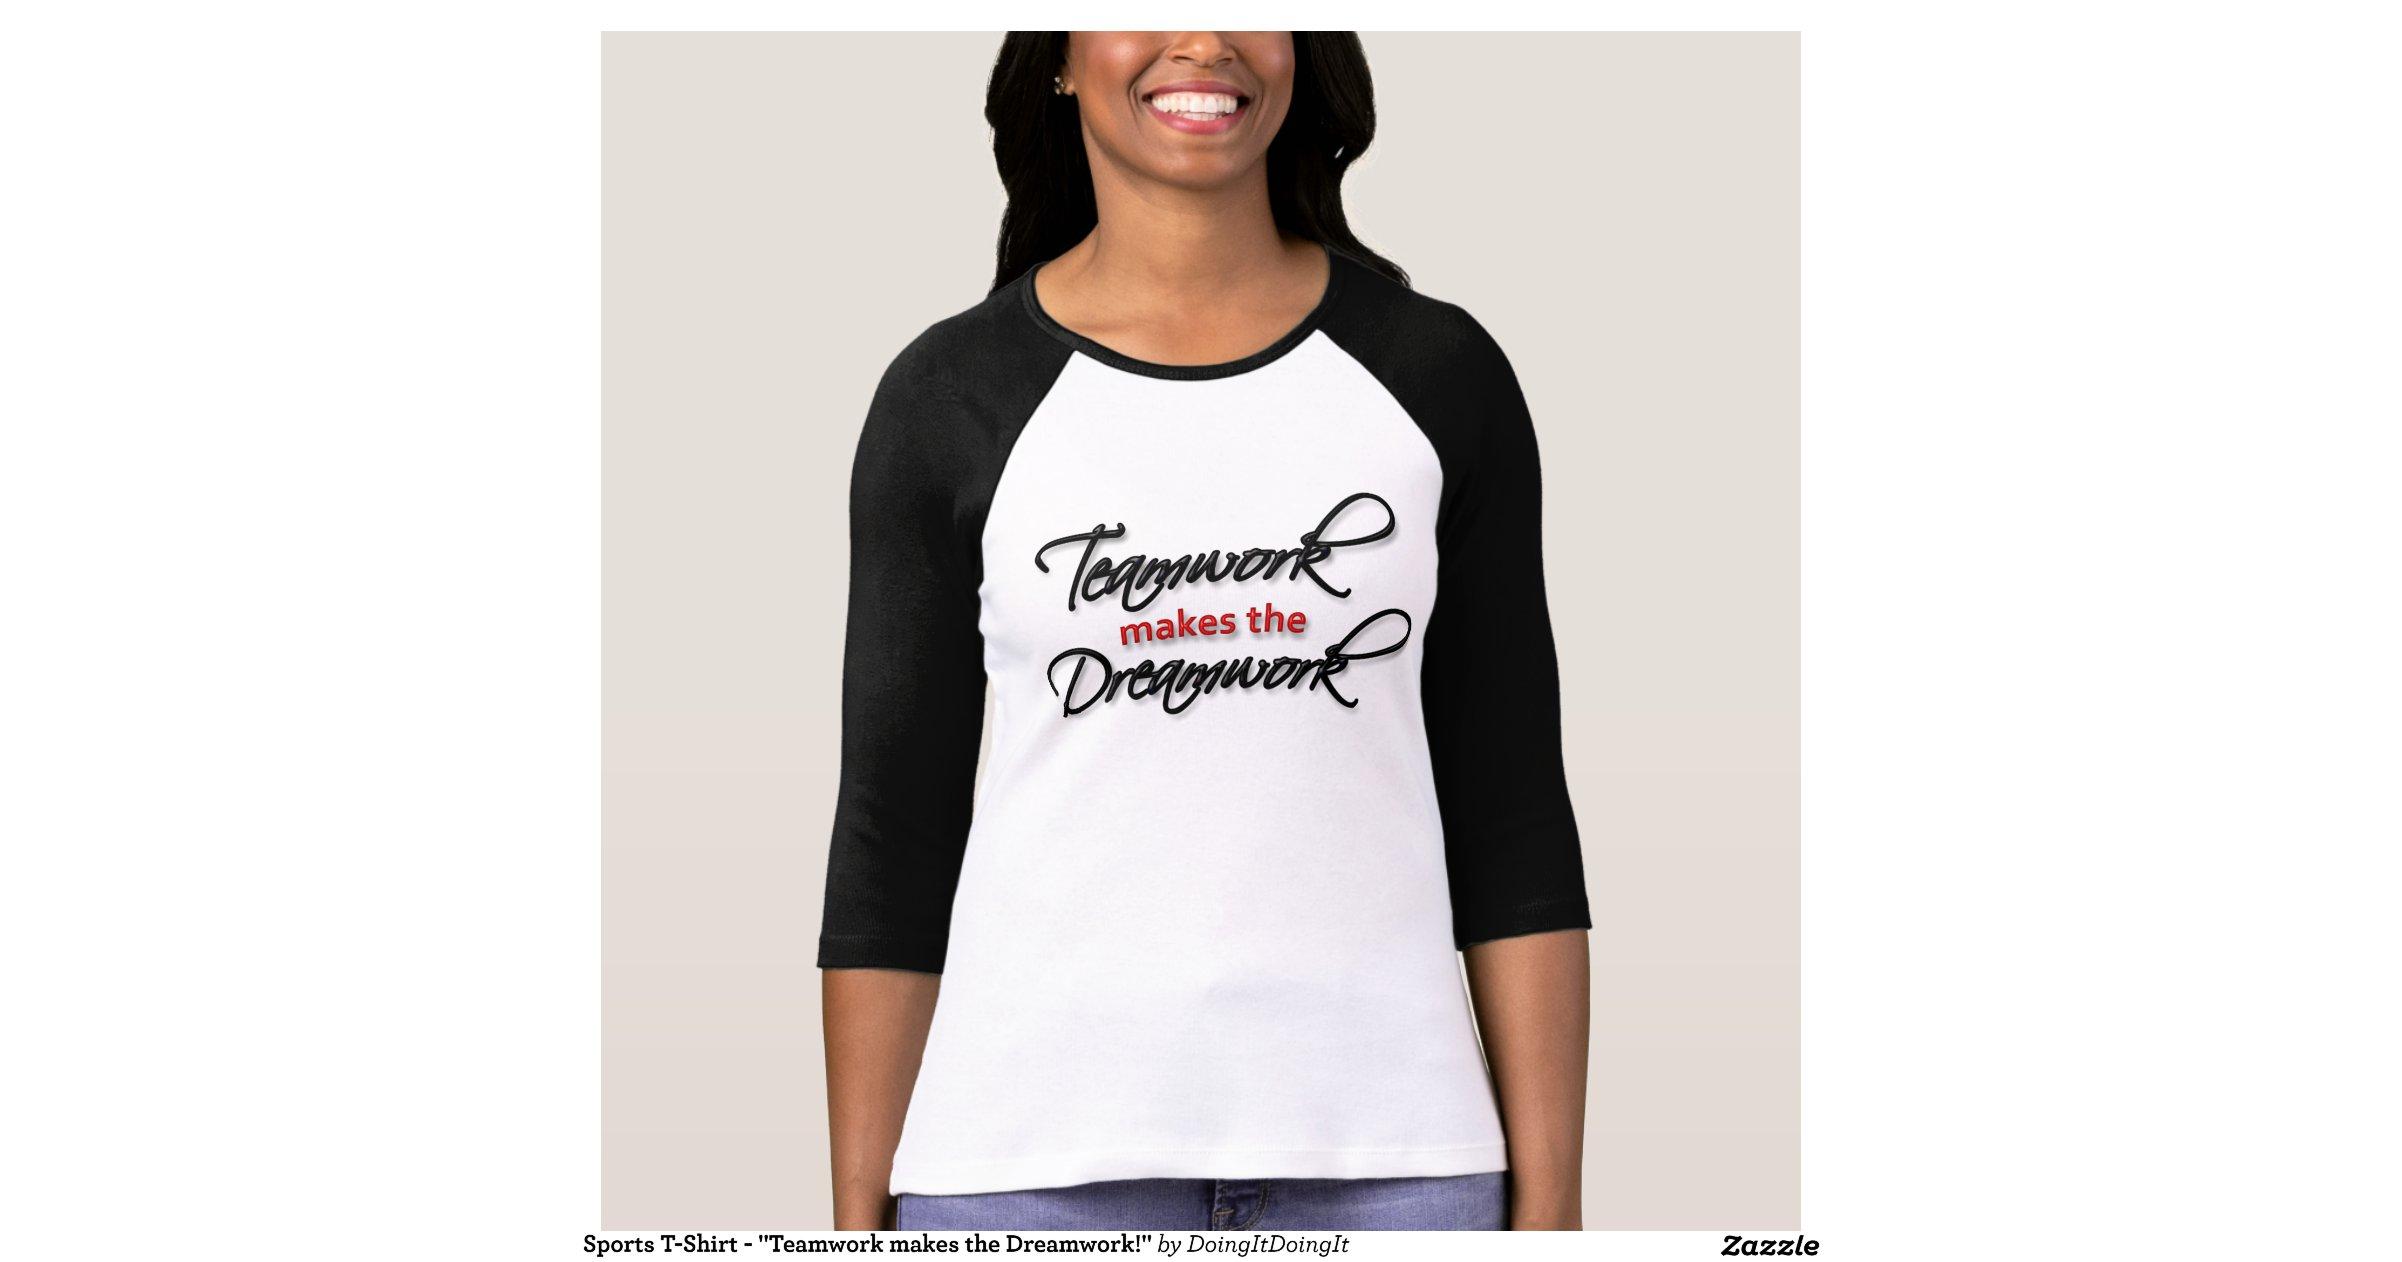 "Sports T-Shirt - ""Teamwork makes the Dreamwork!"" | Zazzle"